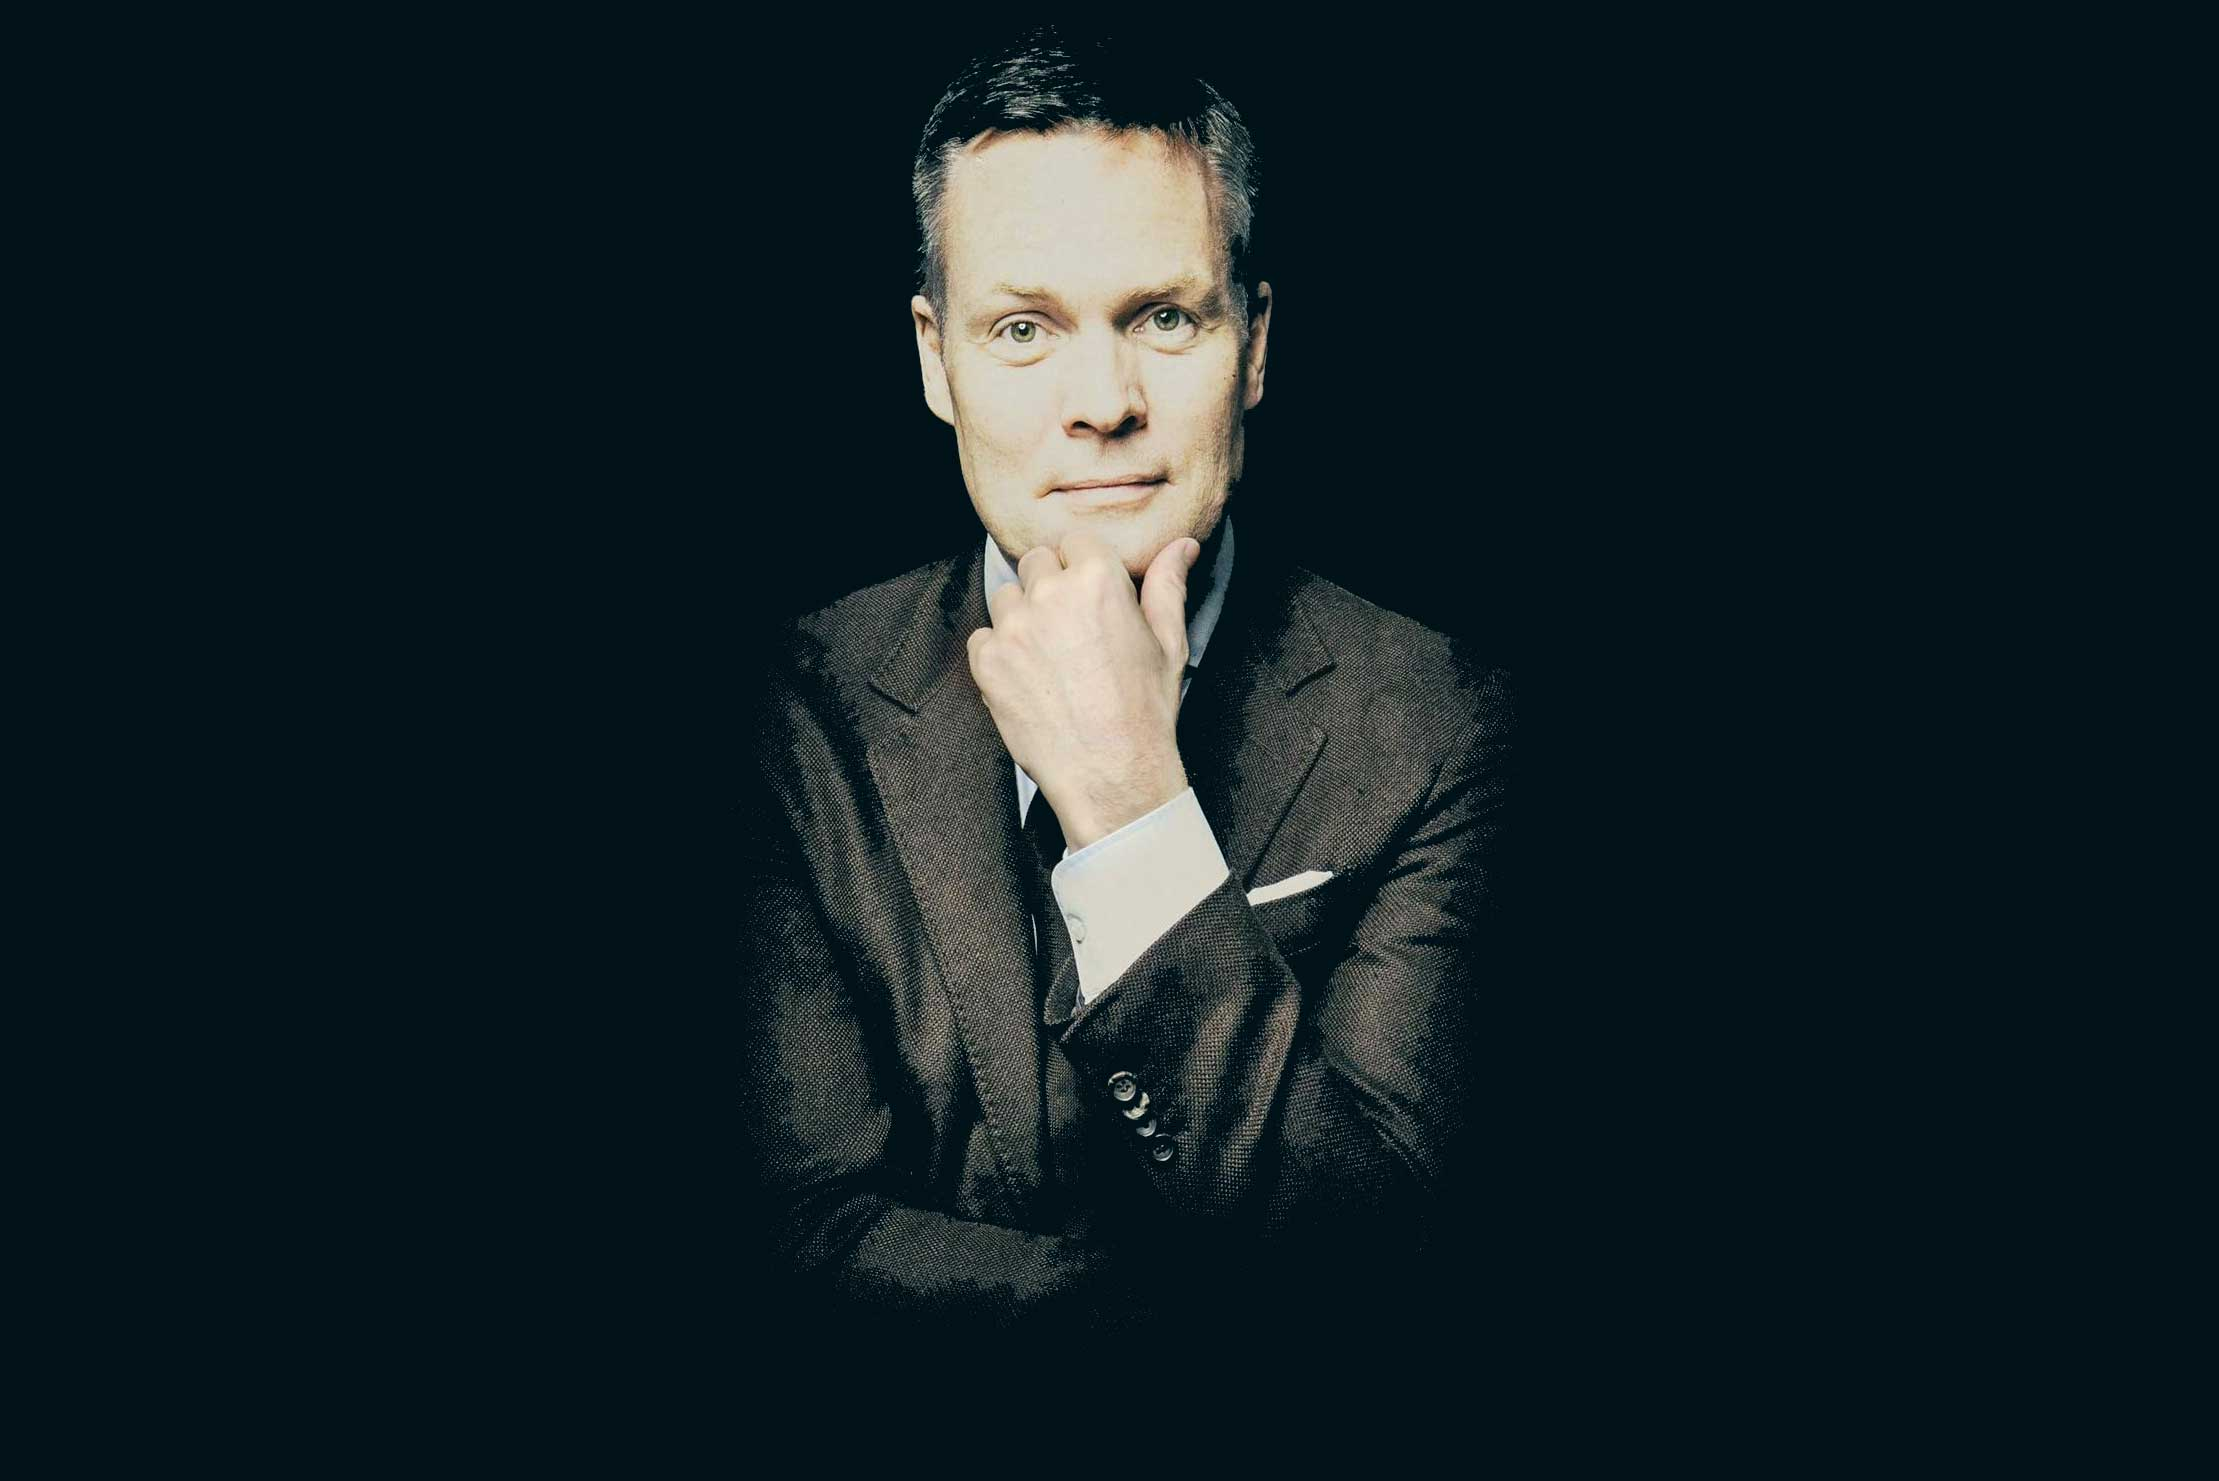 Dr. Michael Stoermer